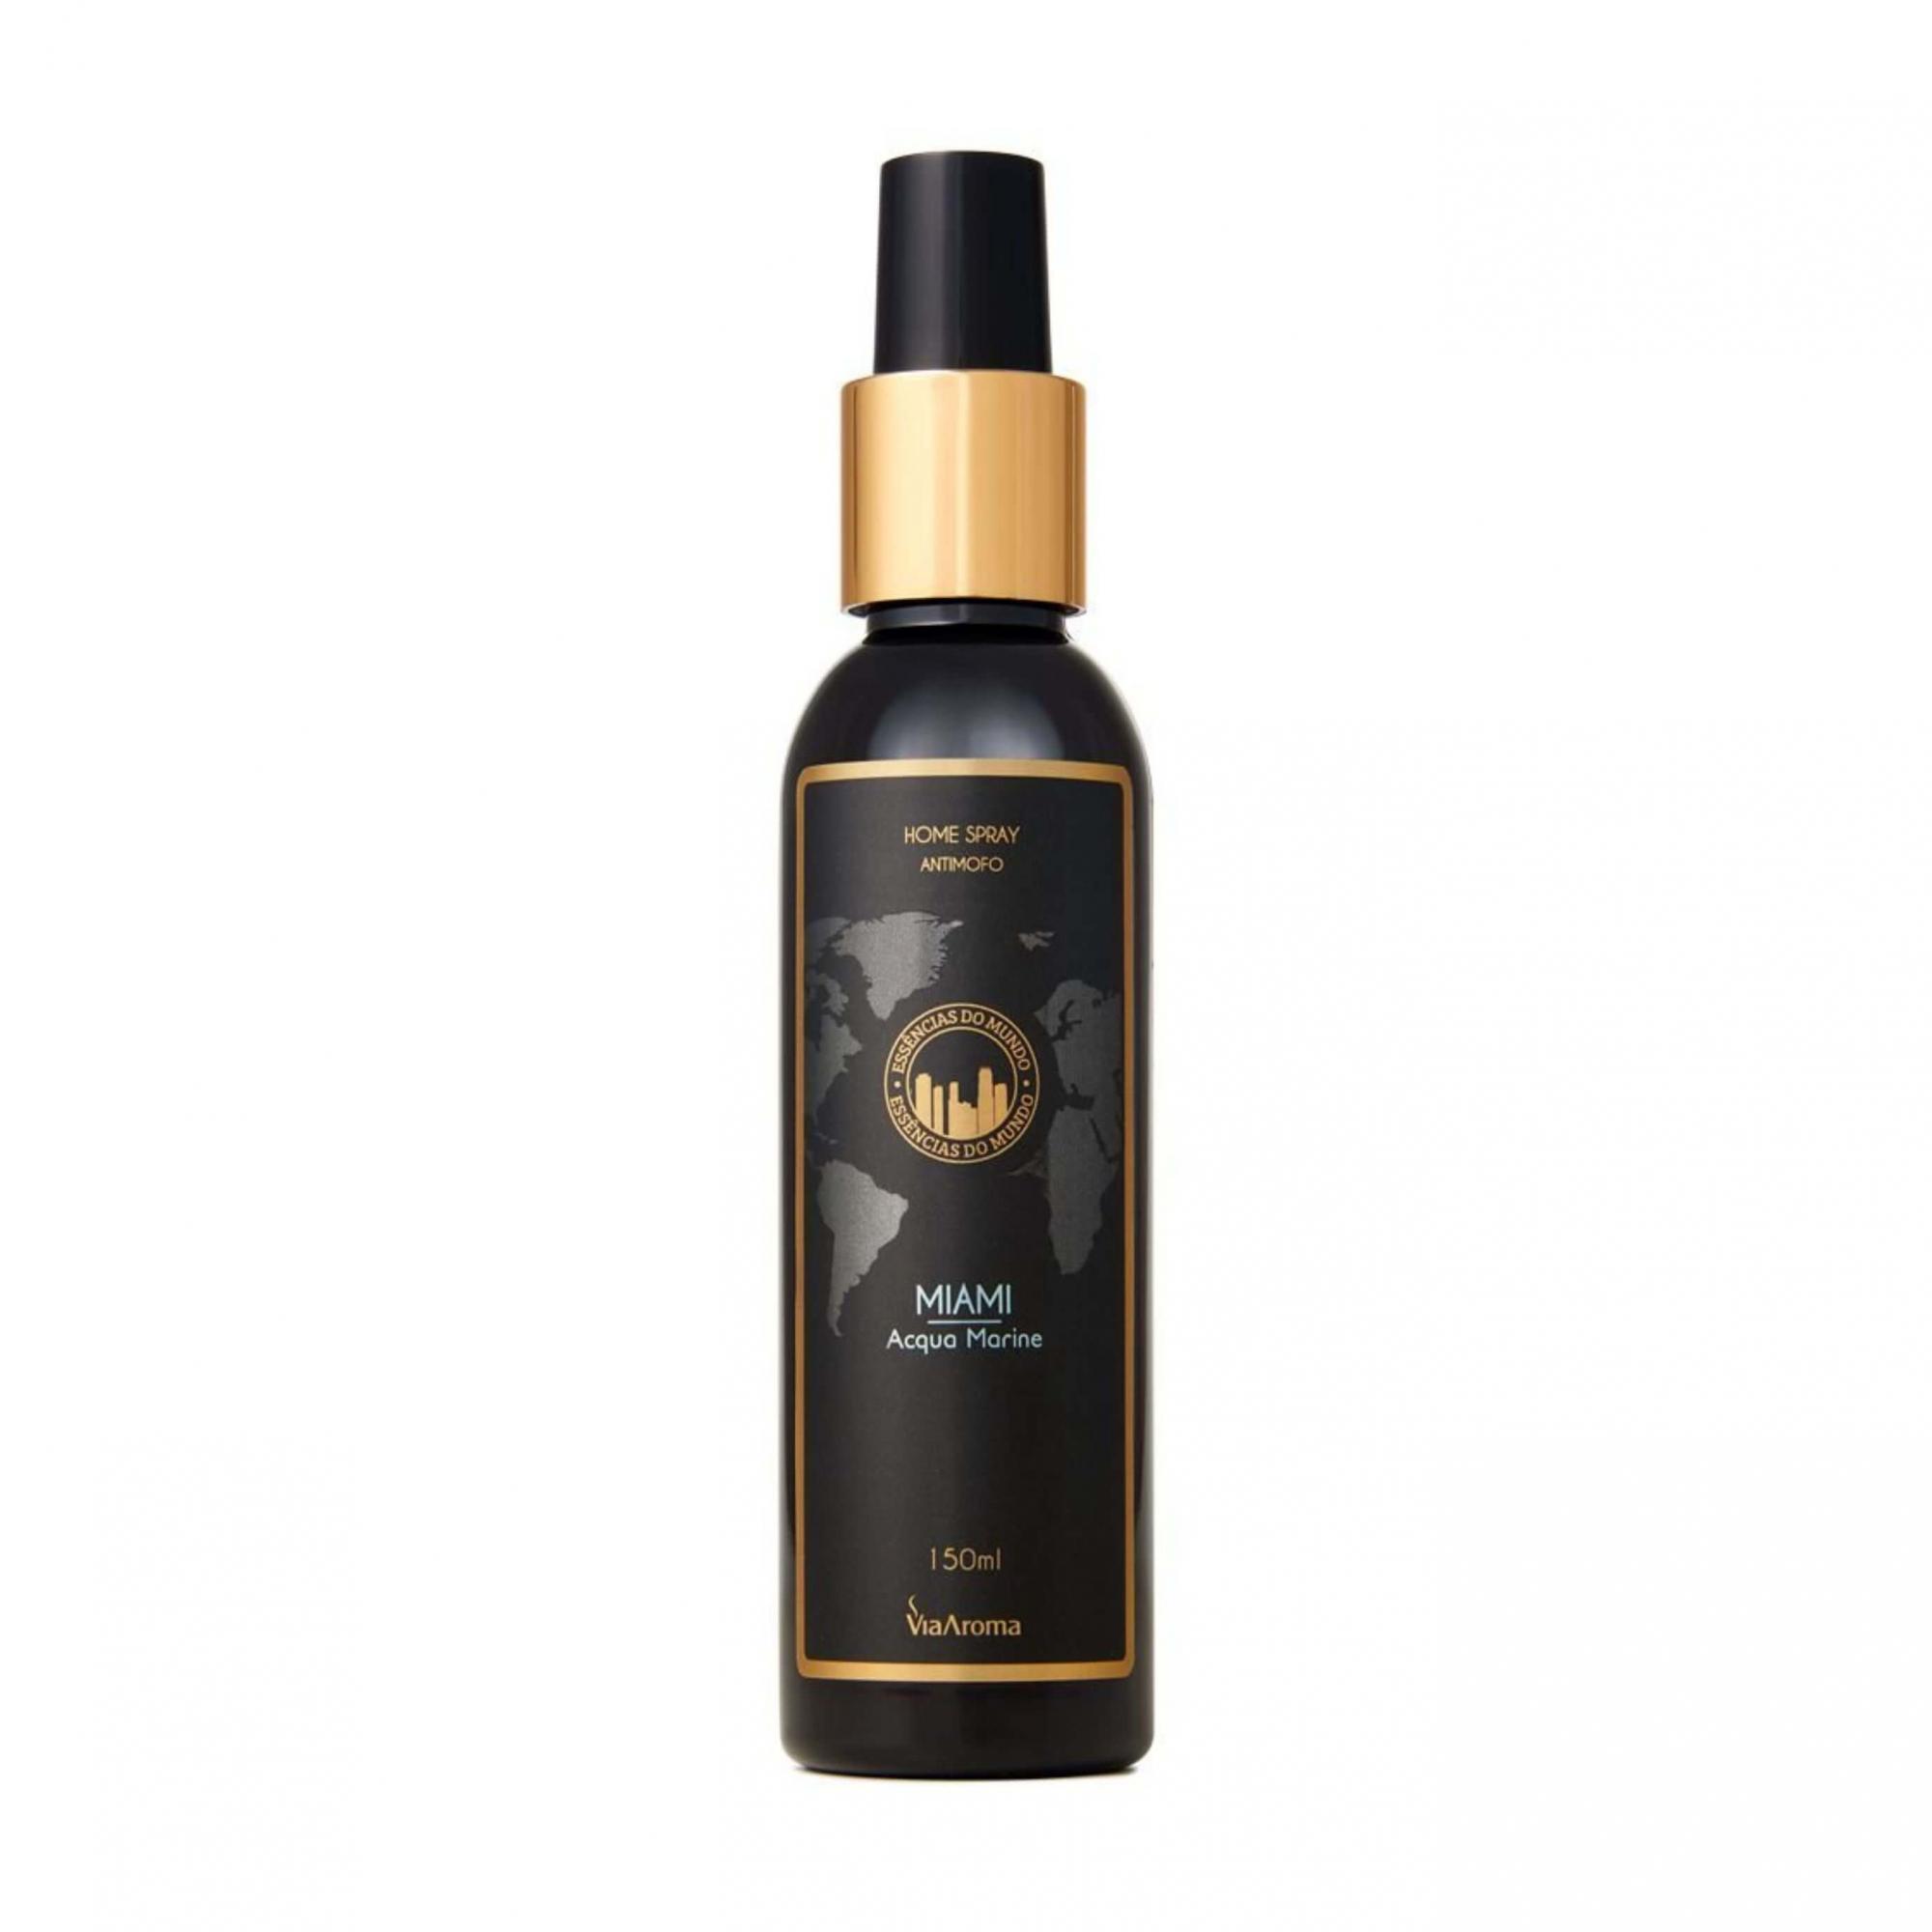 Home Spray Antimofo Miami Via Aroma 150ml